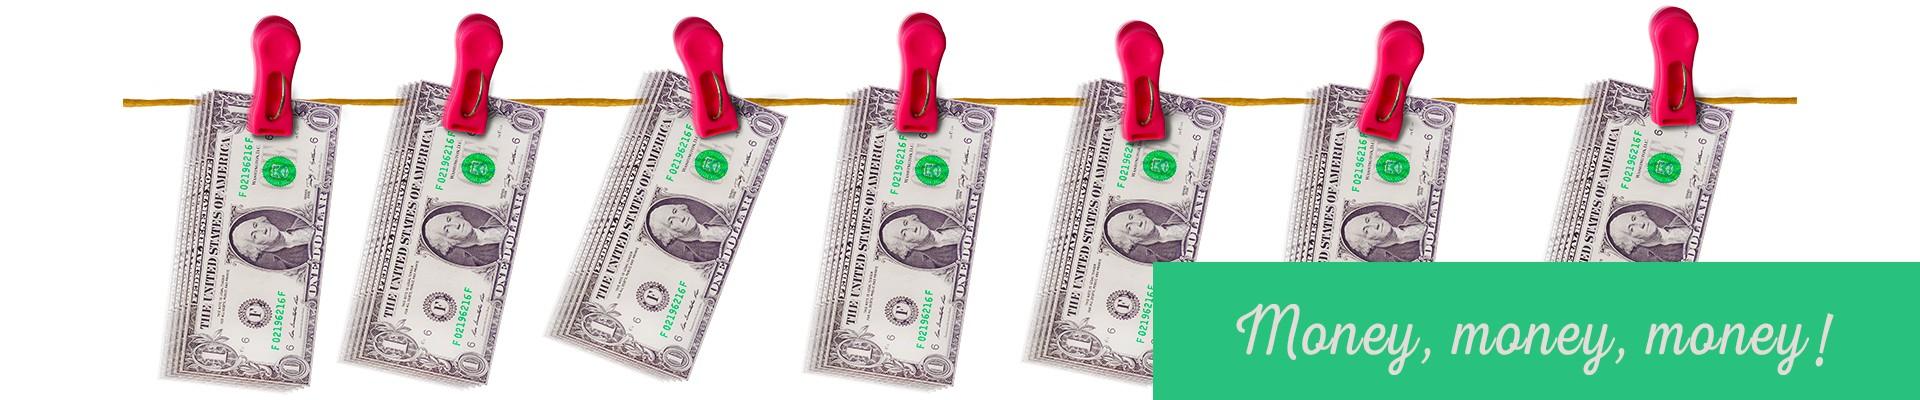 Money money money! dollar bills hanging by clothes pins